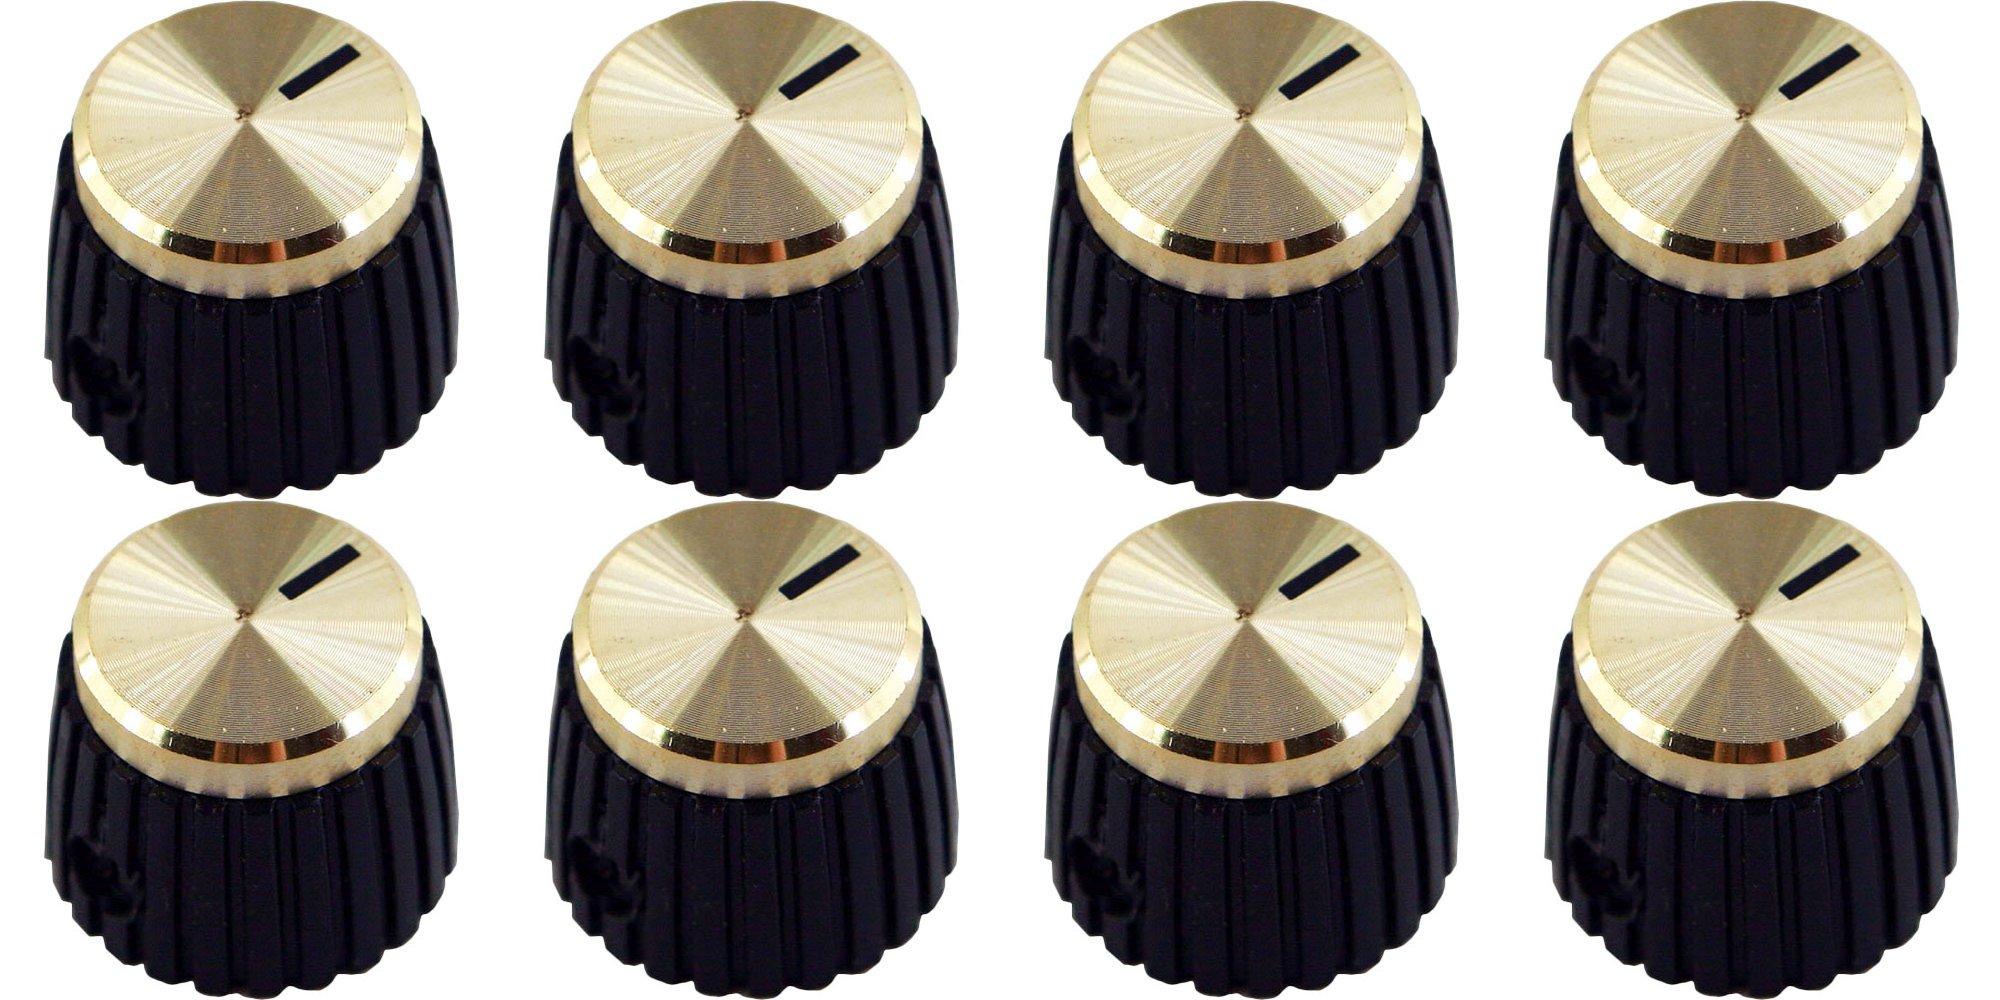 Original Marshall Amplifier Gold D-Shaft Knob Set, Pkg. 8